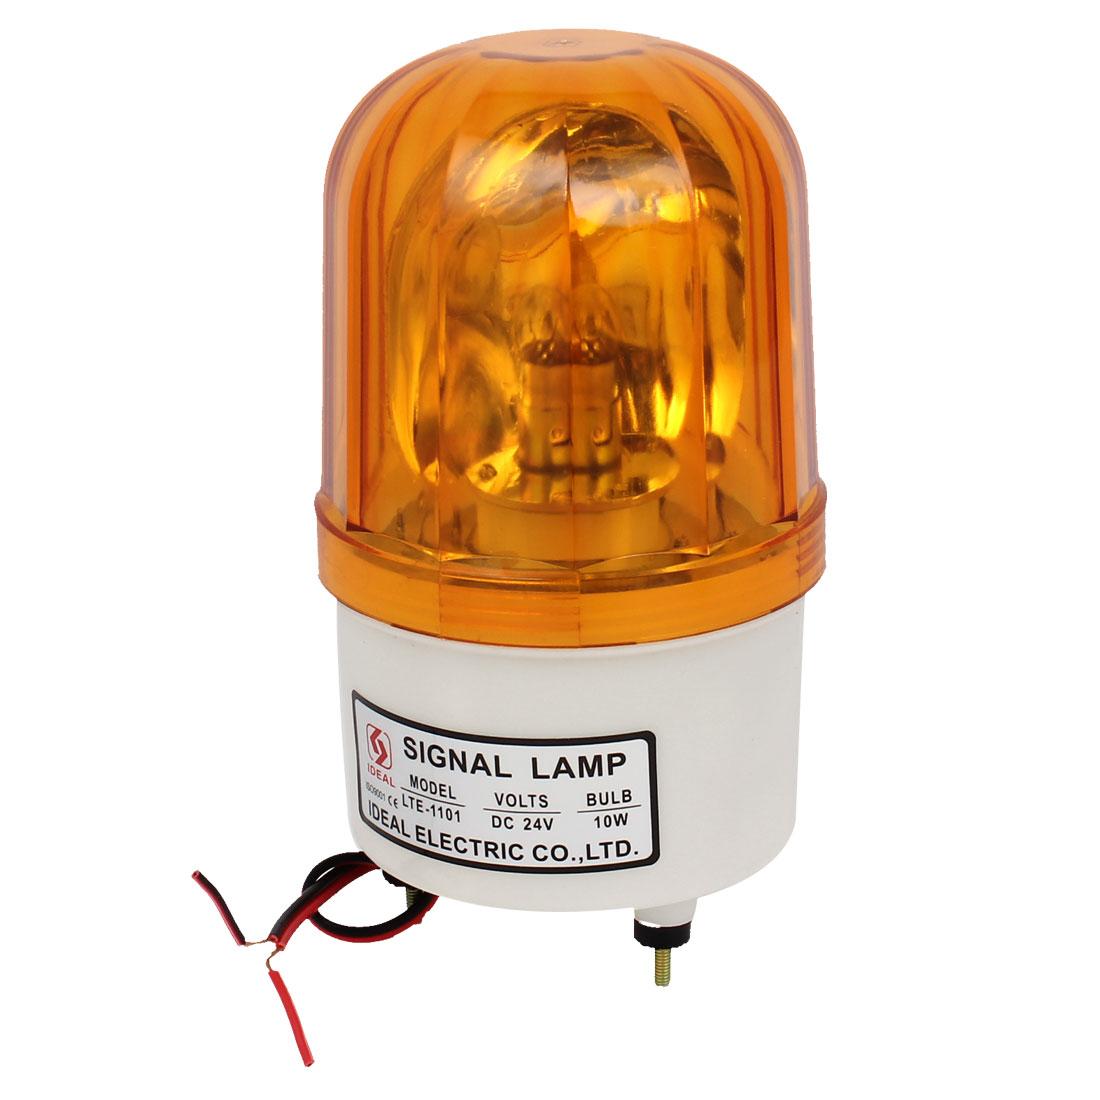 DC 24V Traffic Industrial Strobe Yellow Signal Warning Light